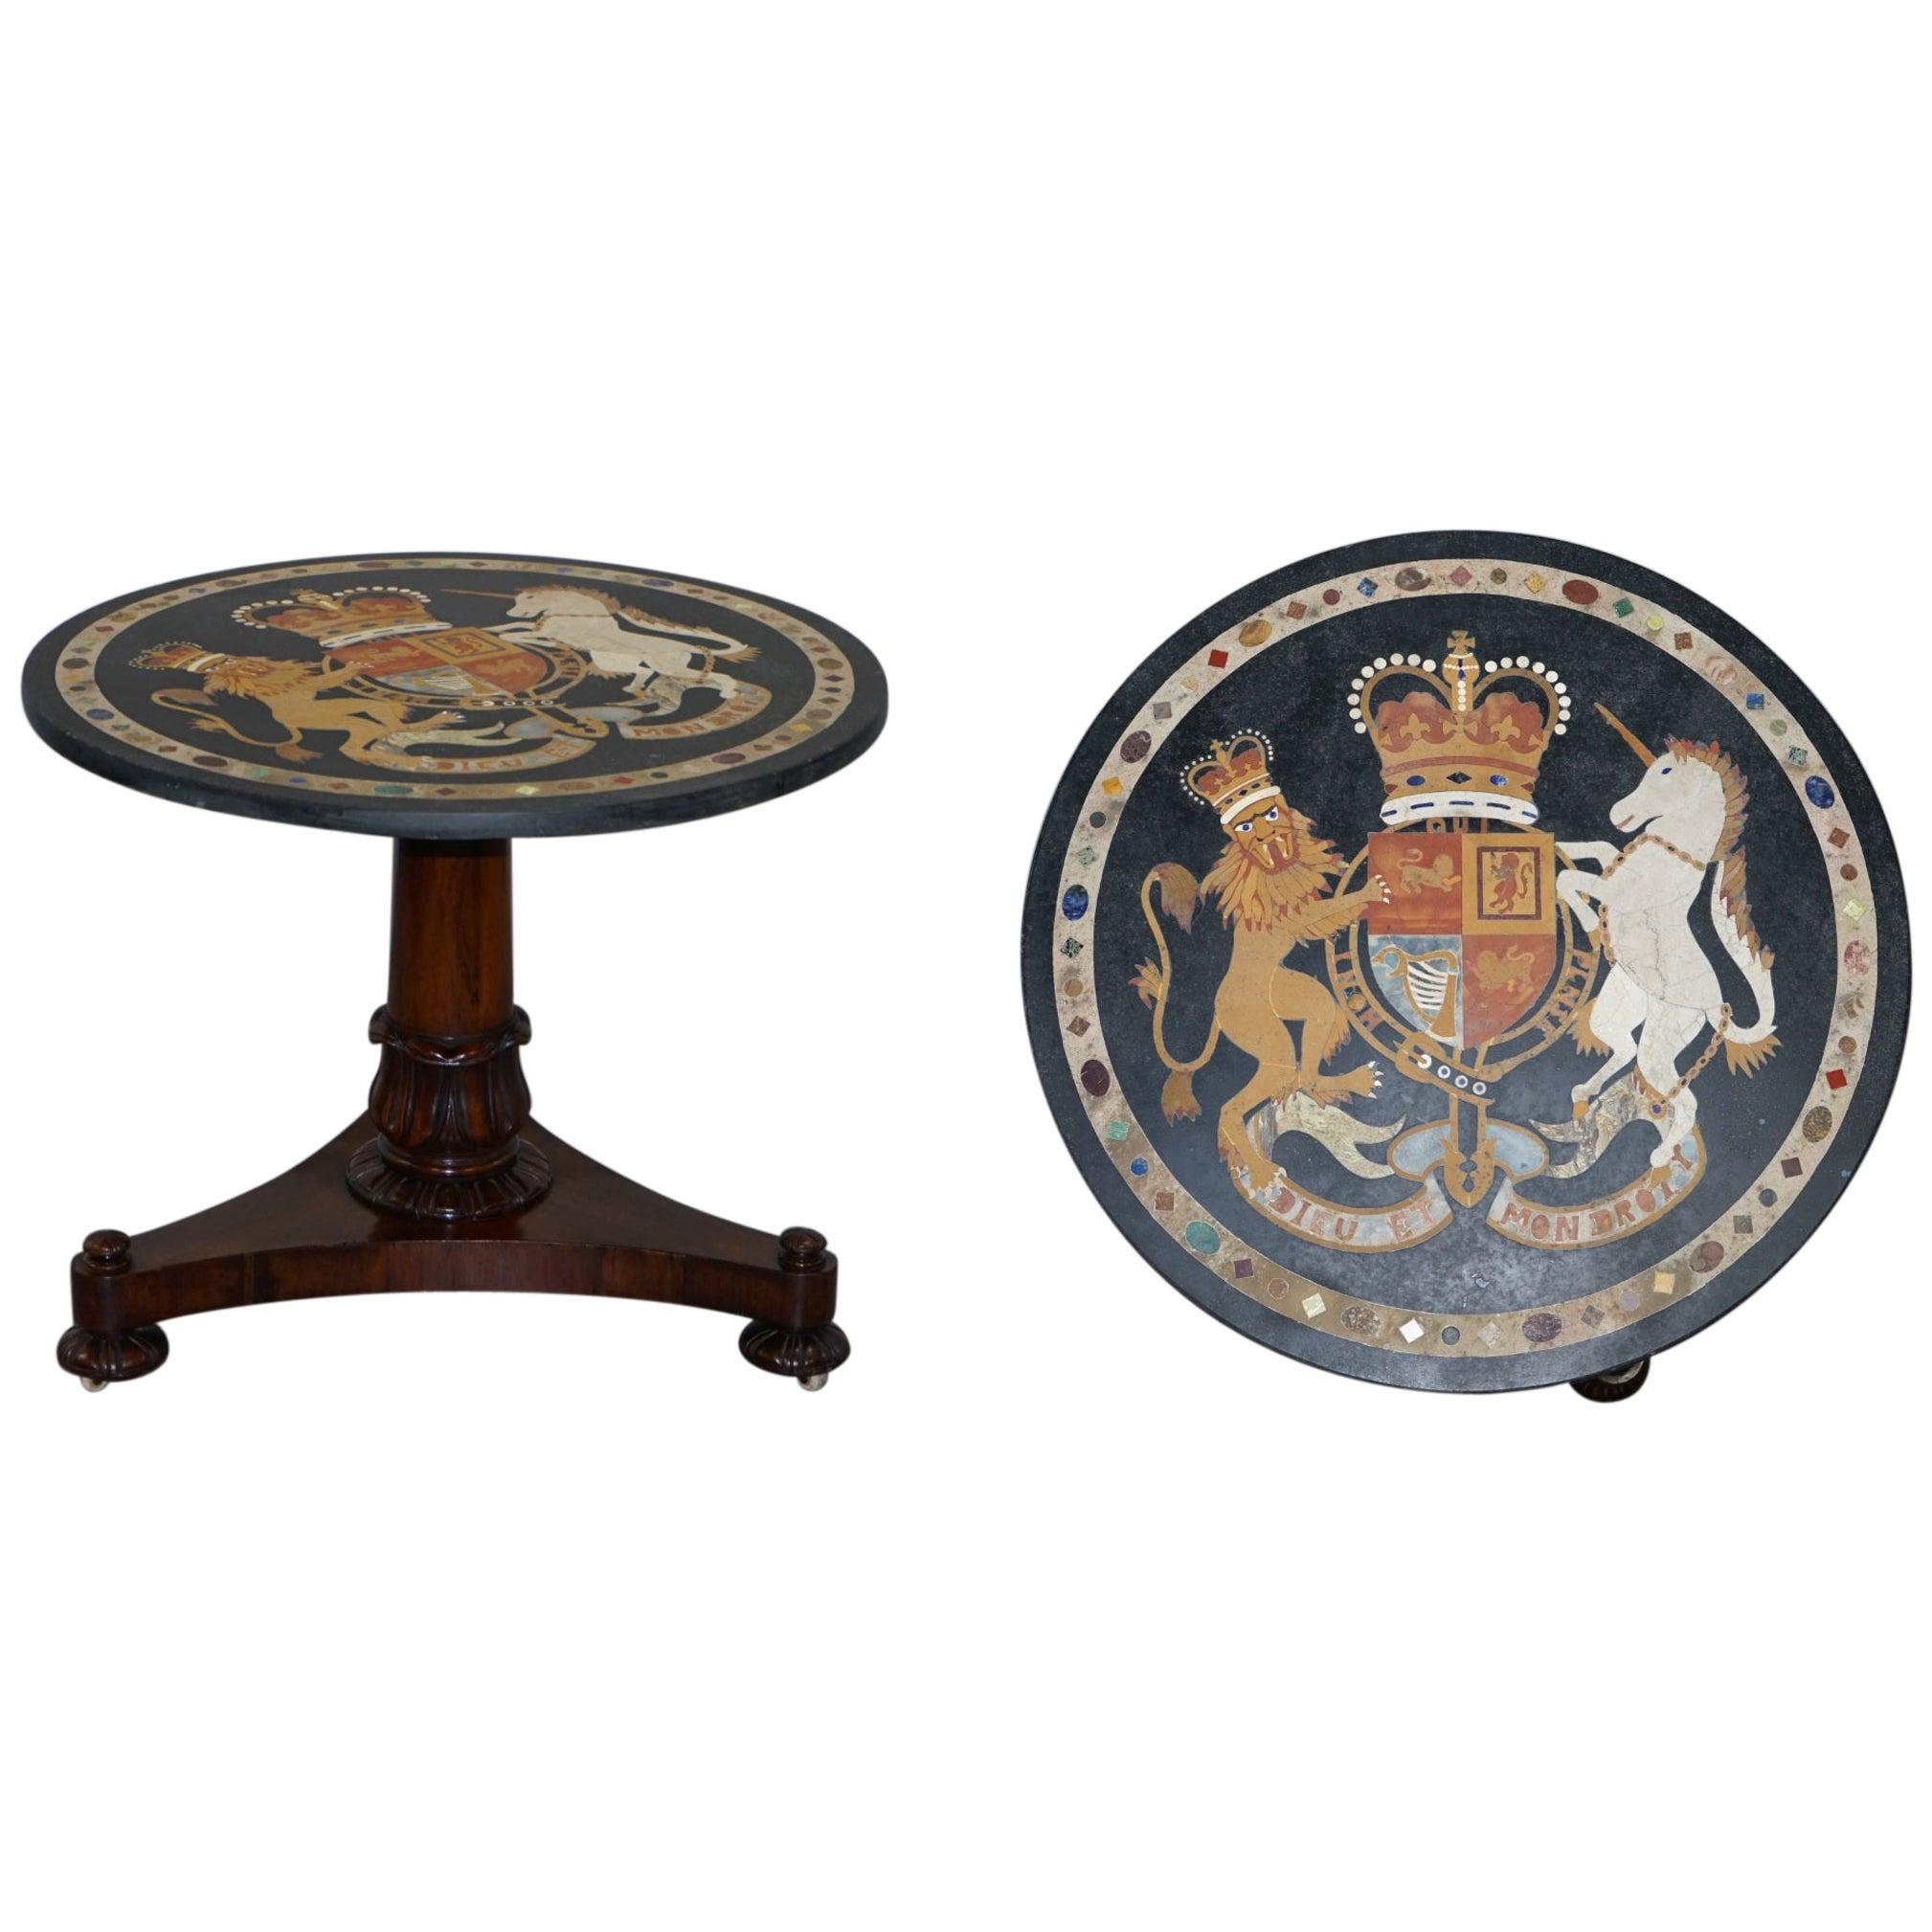 Pietra Dura Specimen Marble Centre Table Coat of Arms William iv Hardwood Base